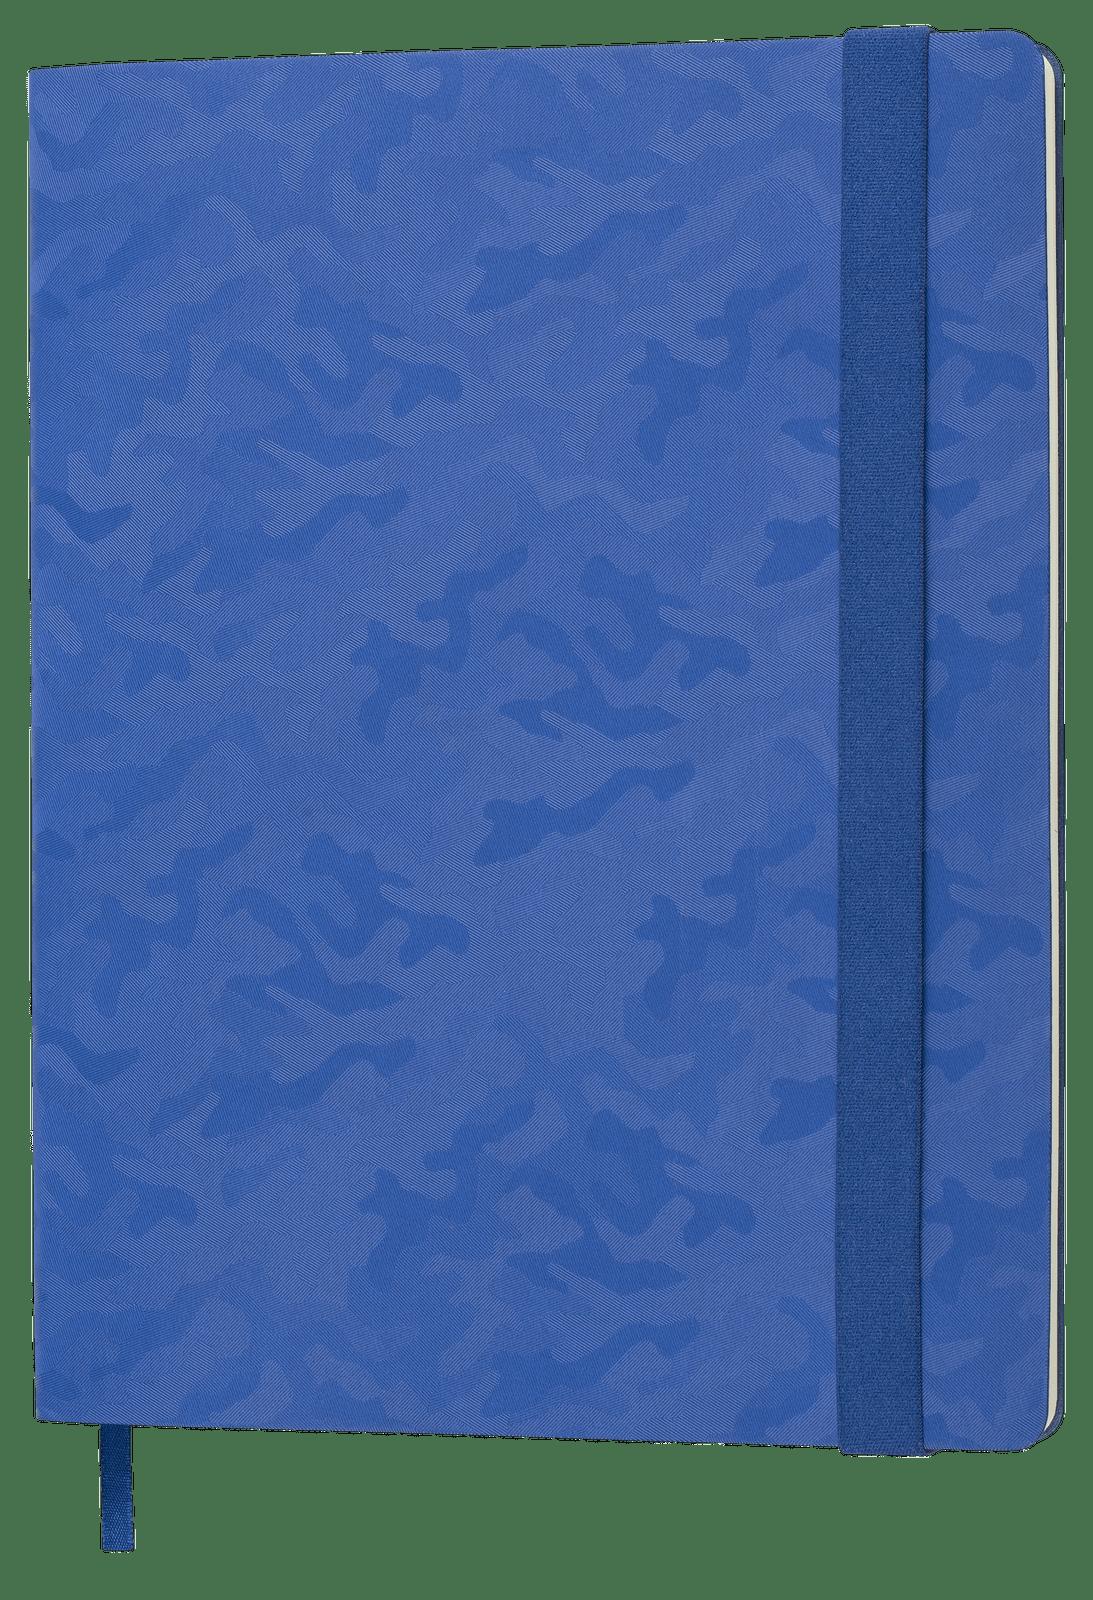 TM21228_25 - Tabby Biggy azul royal